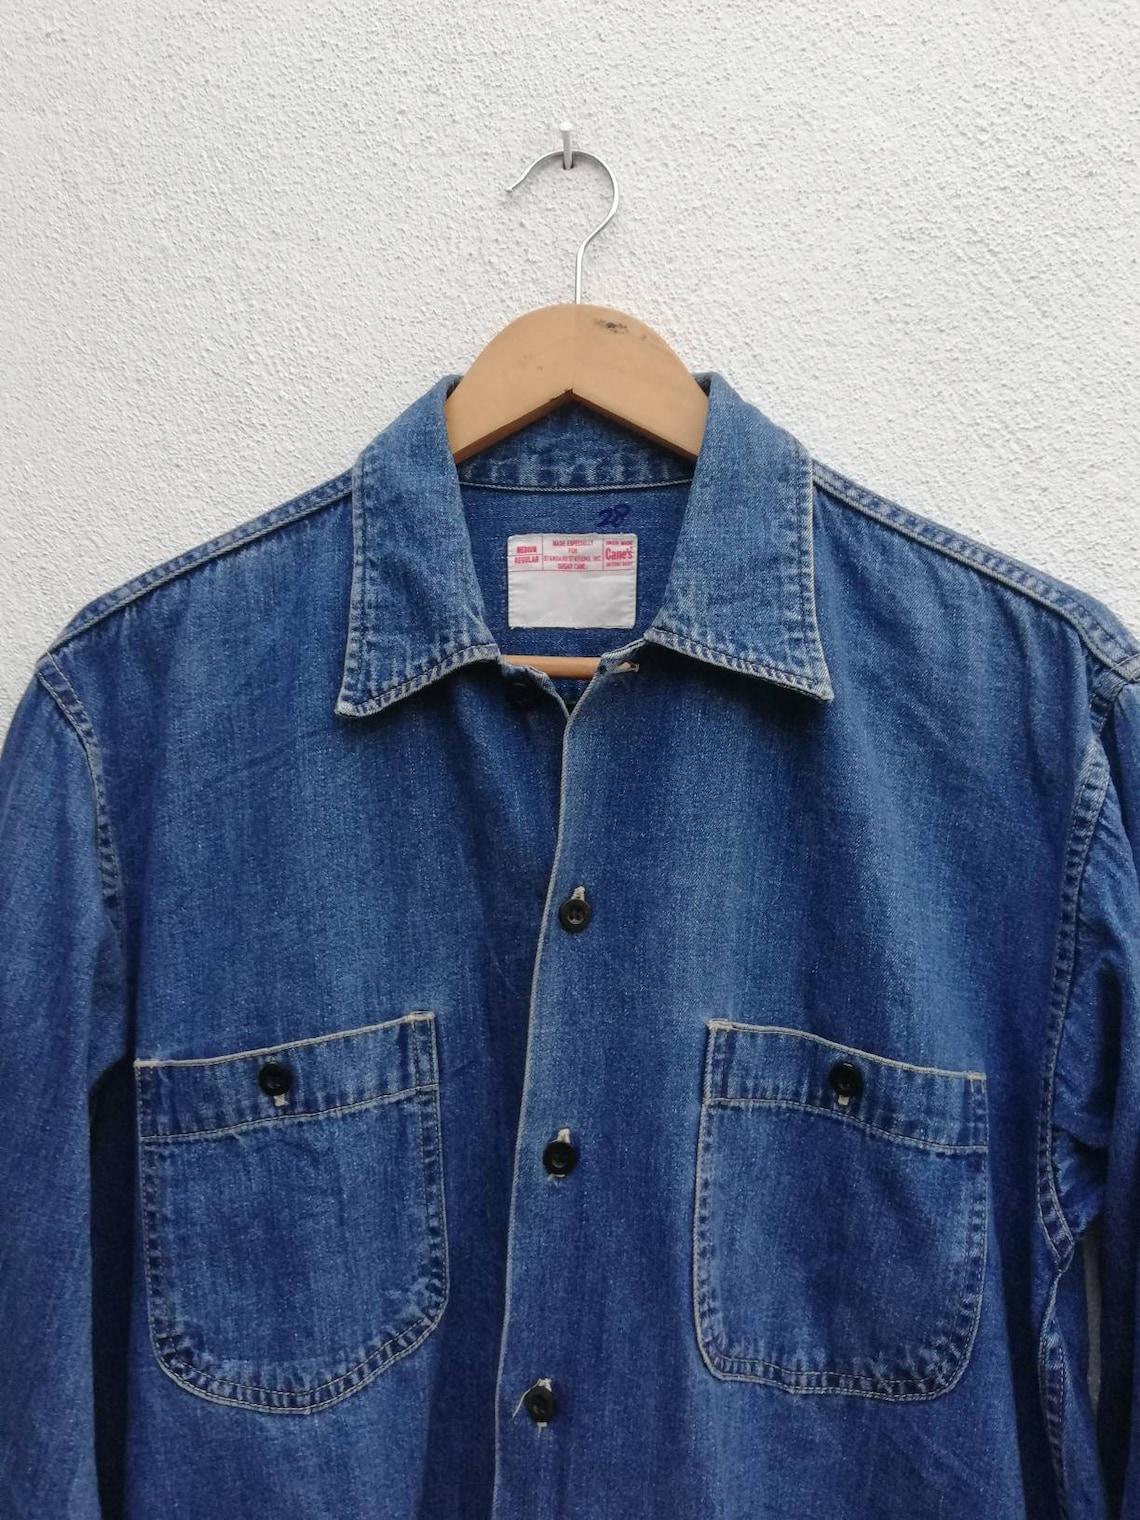 91f590b2d61 Vintage Sugar Cane Japan Denim Selvedge Worker Shirt Union